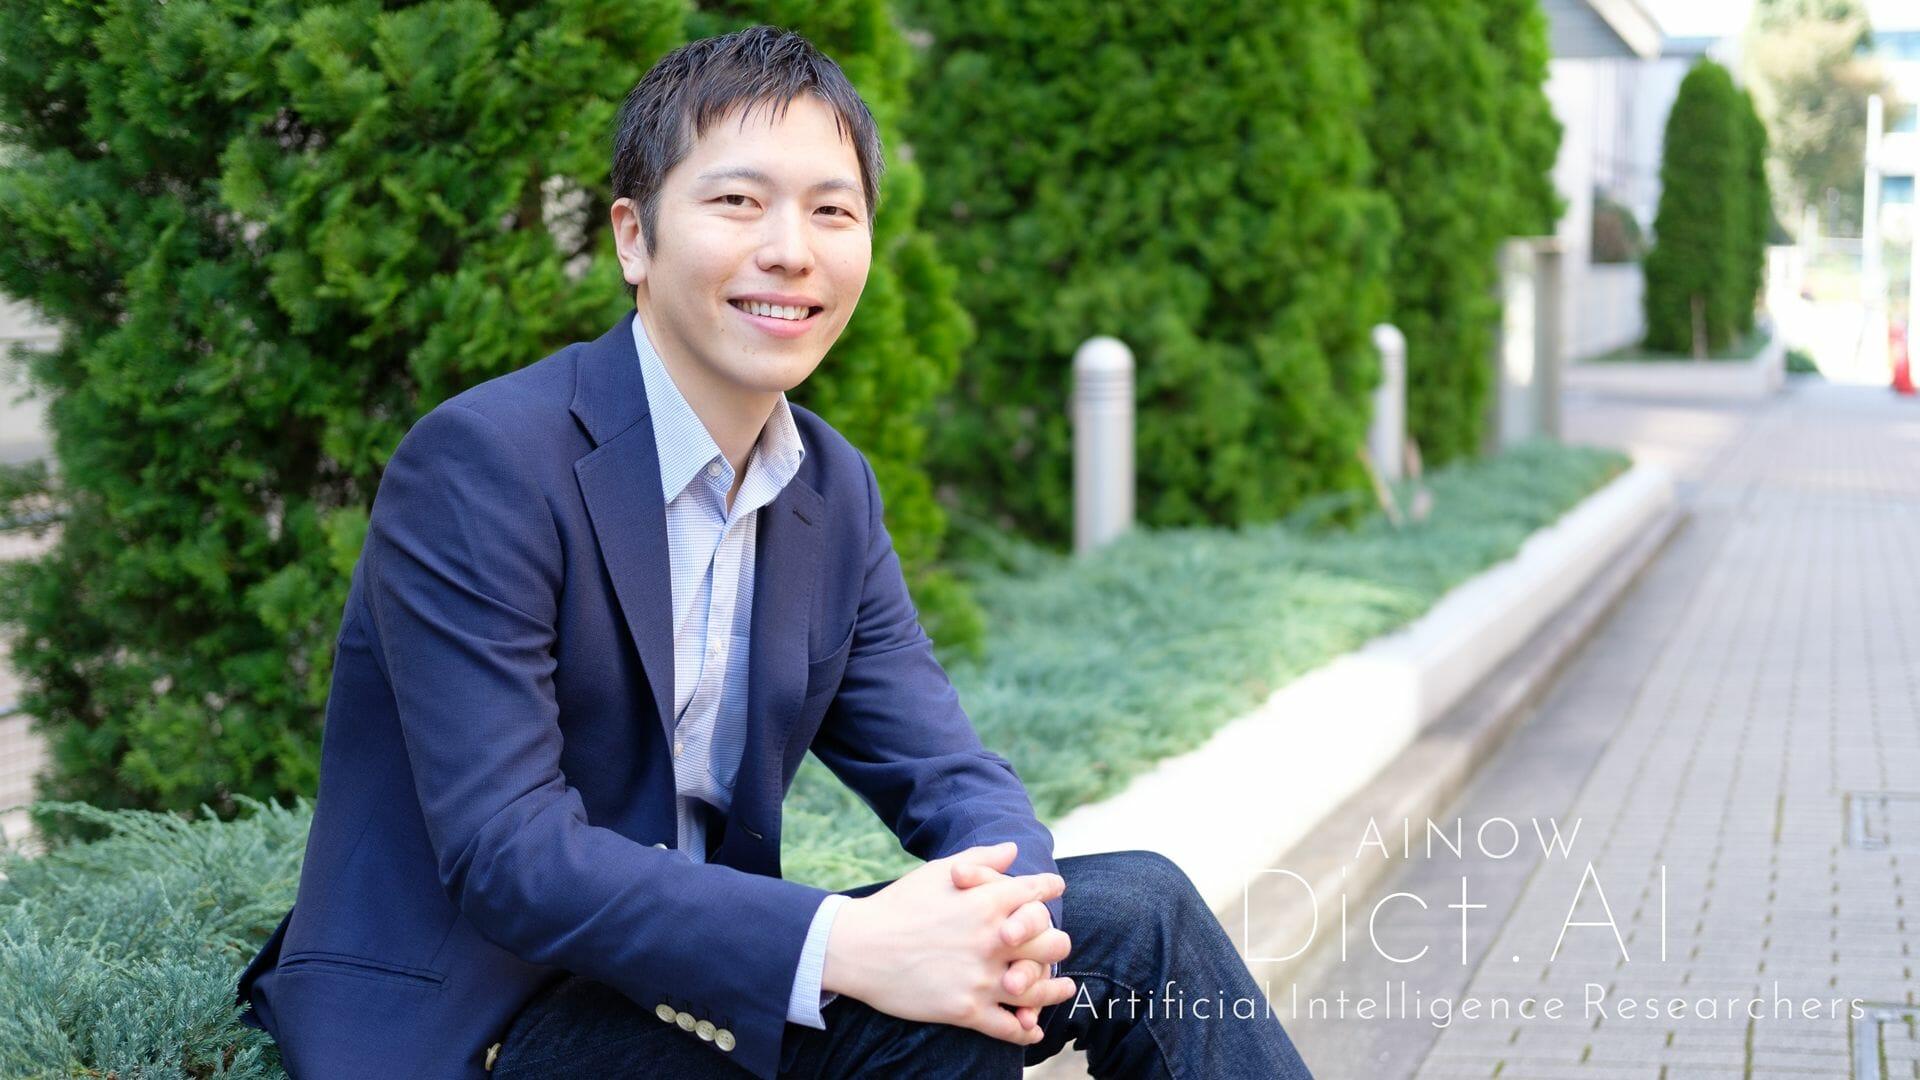 Dict.AI 姥貝 賢次 / カウンティア株式会社 | AI専門ニュースメディア ...